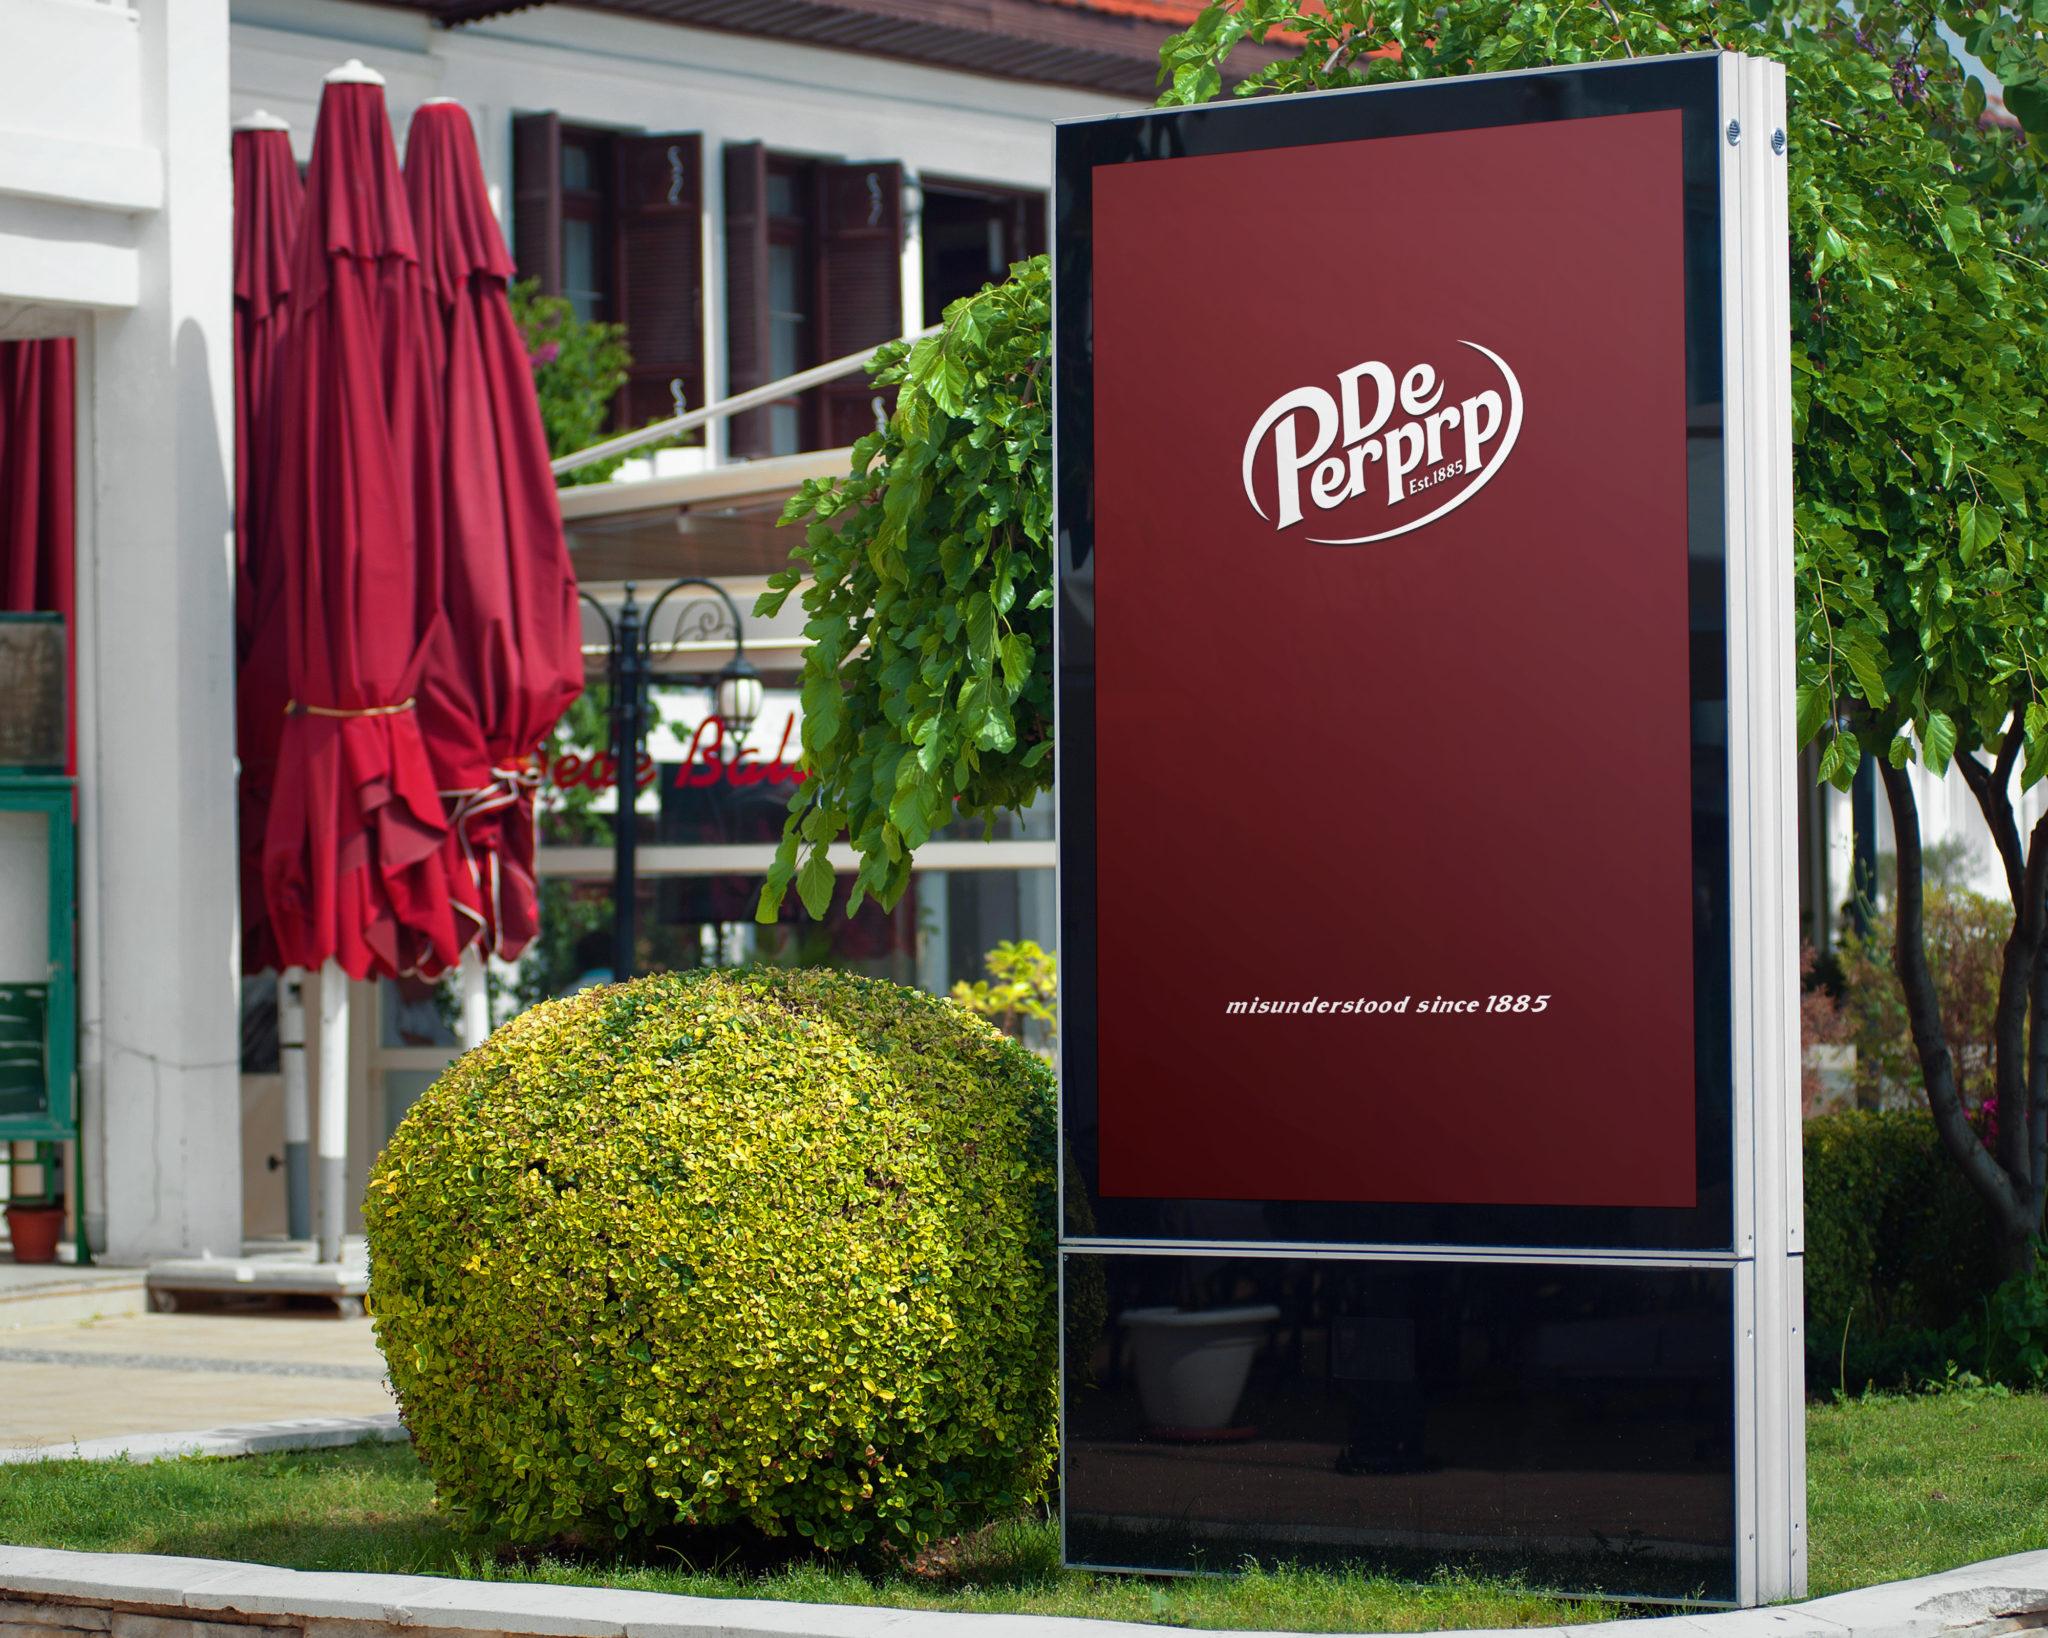 Dr Pepper - Misunderstood Since 1885 Advert